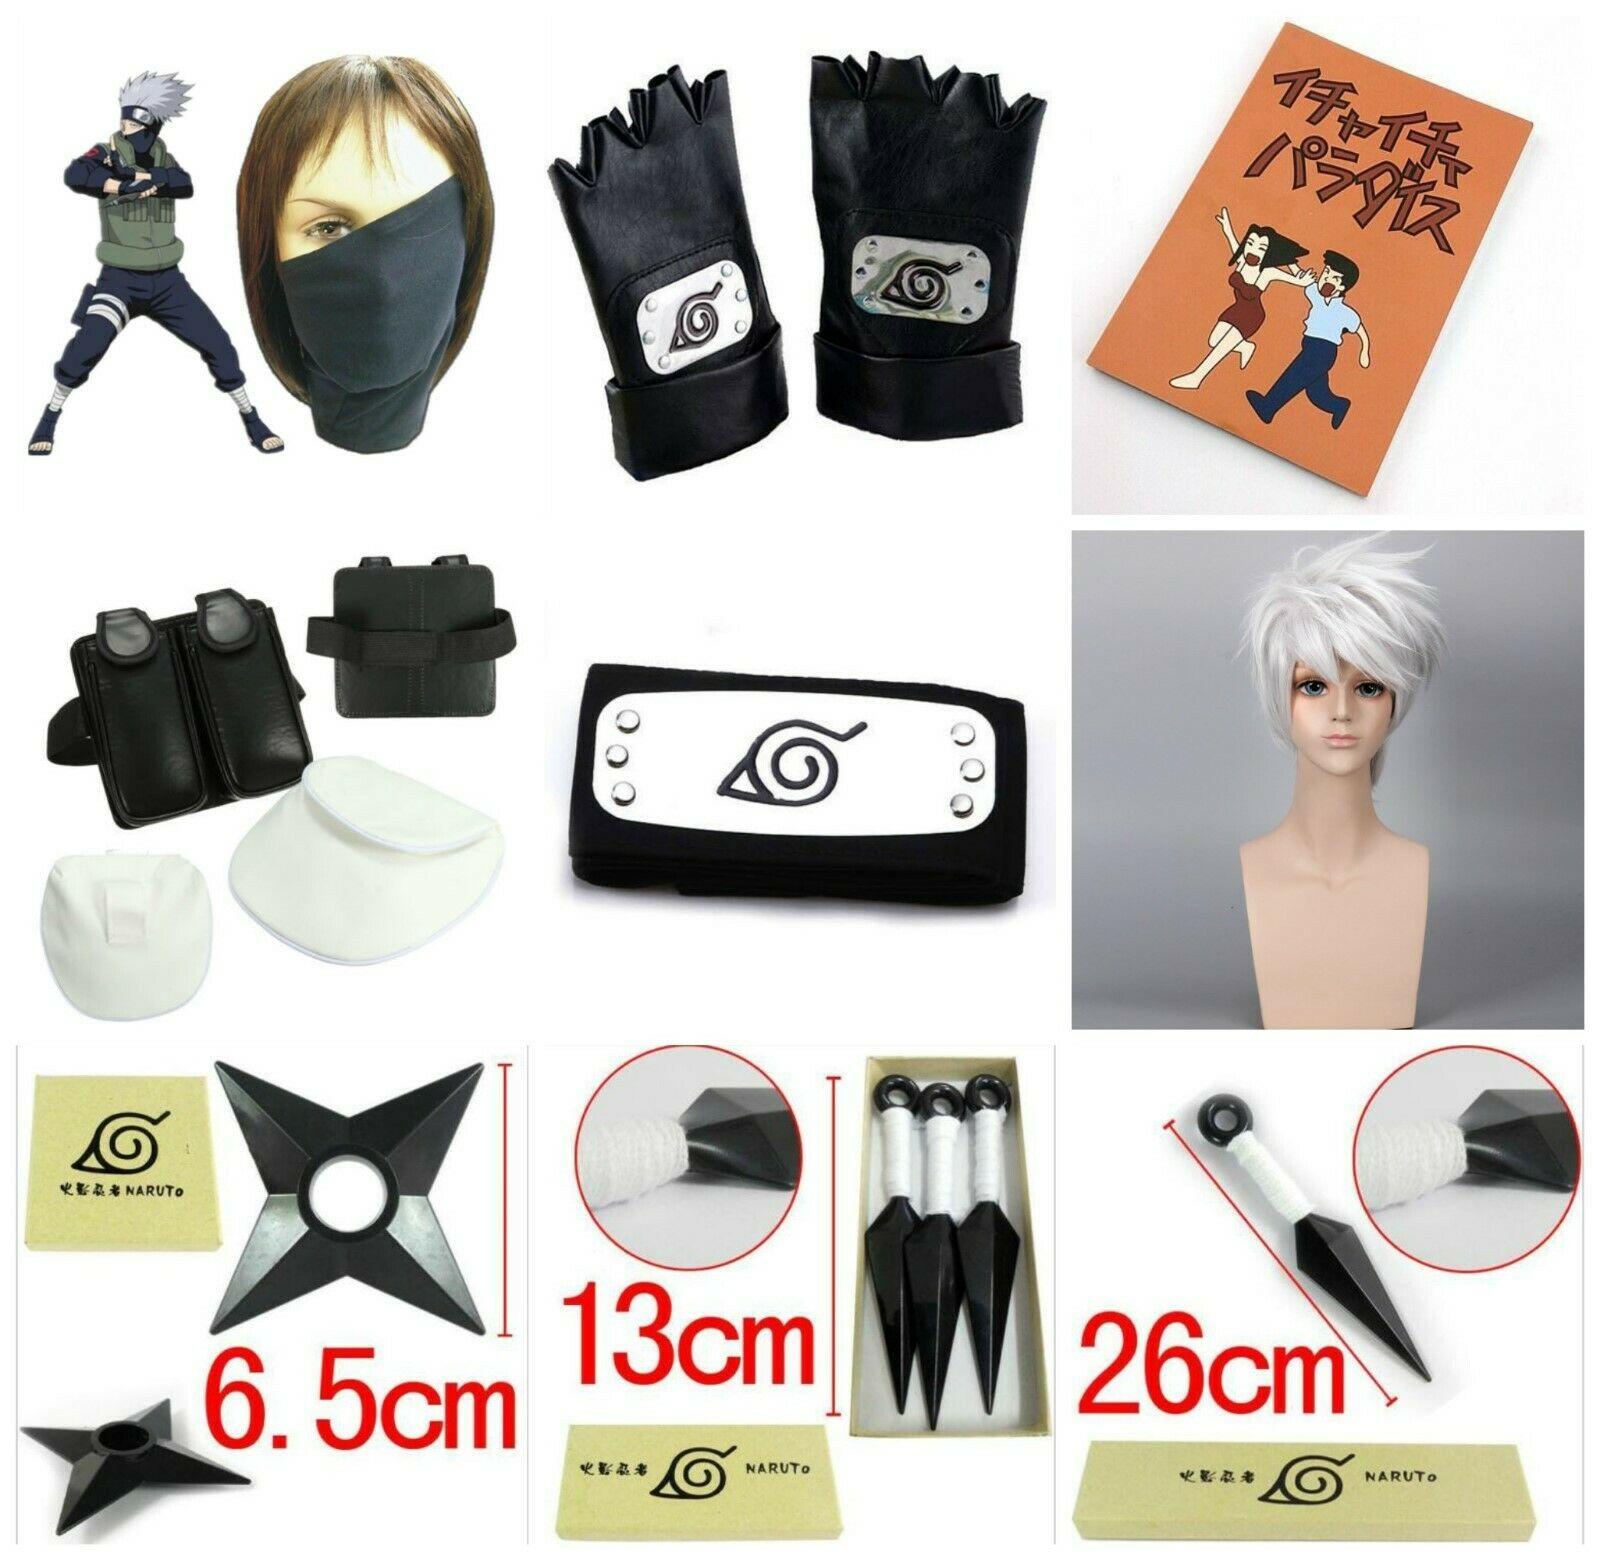 Anime Naruto Hatake Kakashi Cosplay Headband Gloves Wig Face Mask Darts Accessory Shuriken Japanese Halloween Party Apparel